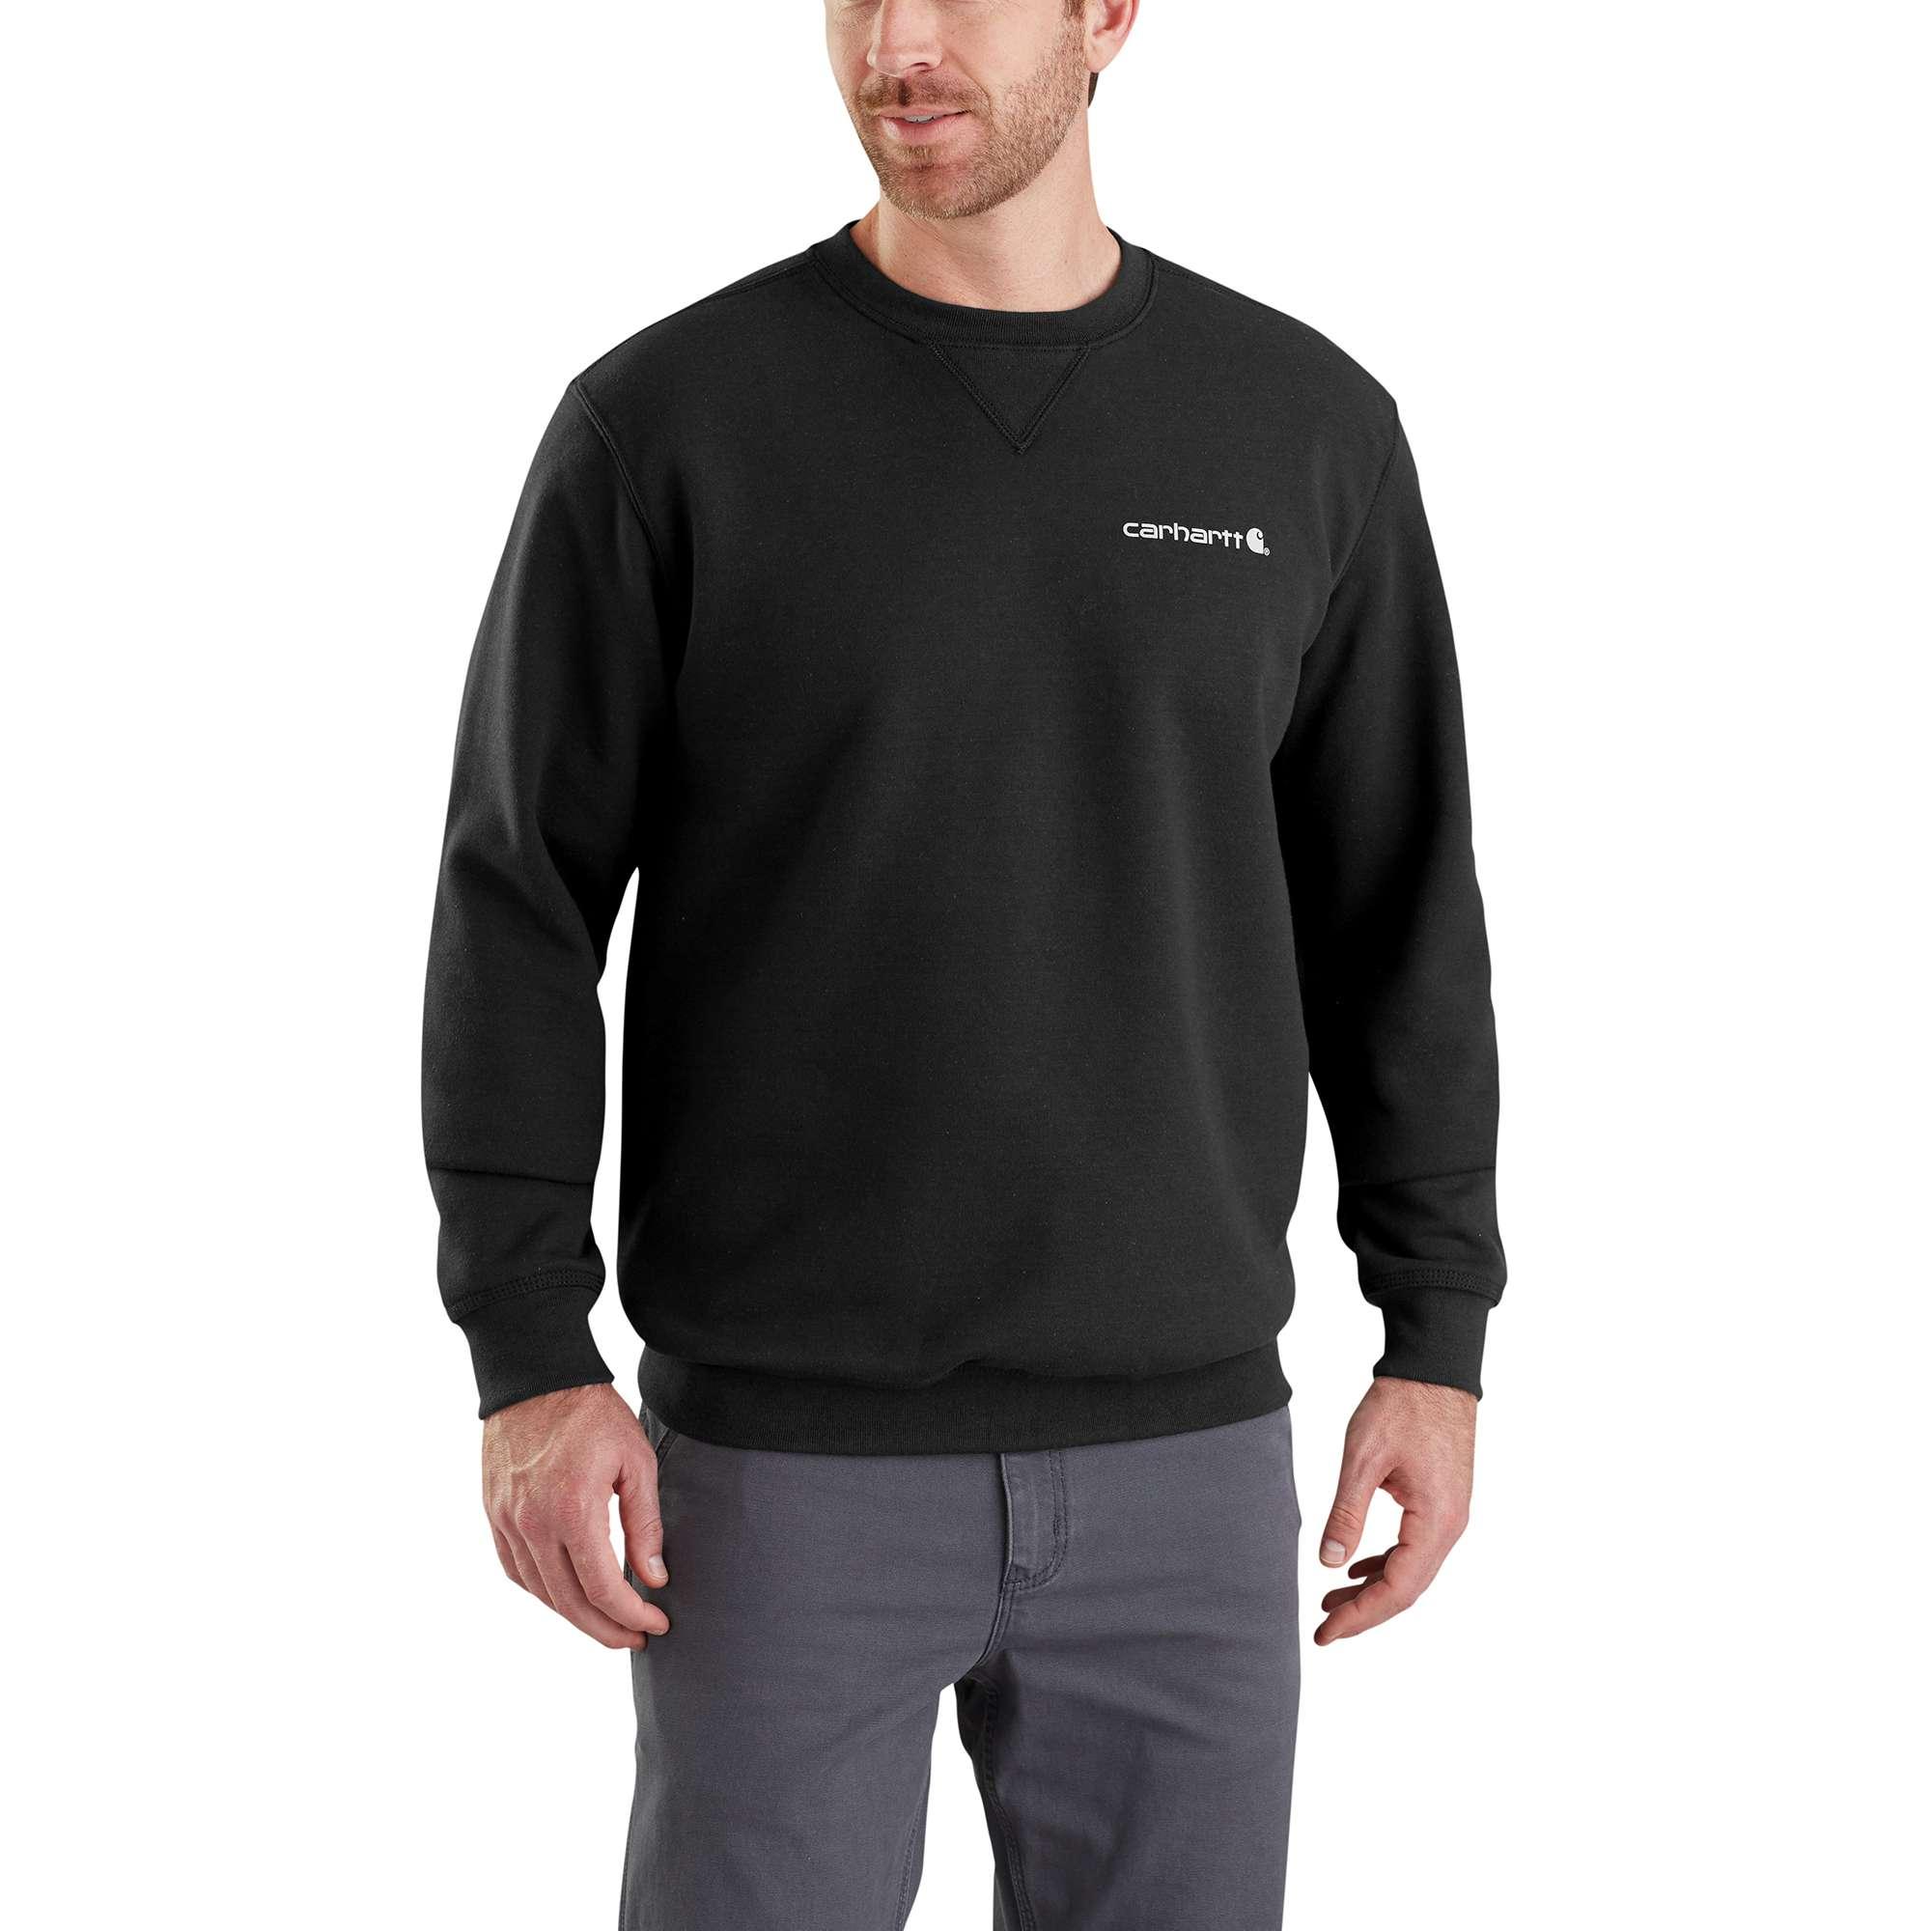 Carhartt Midweight Graphic Crewneck Sweatshirt